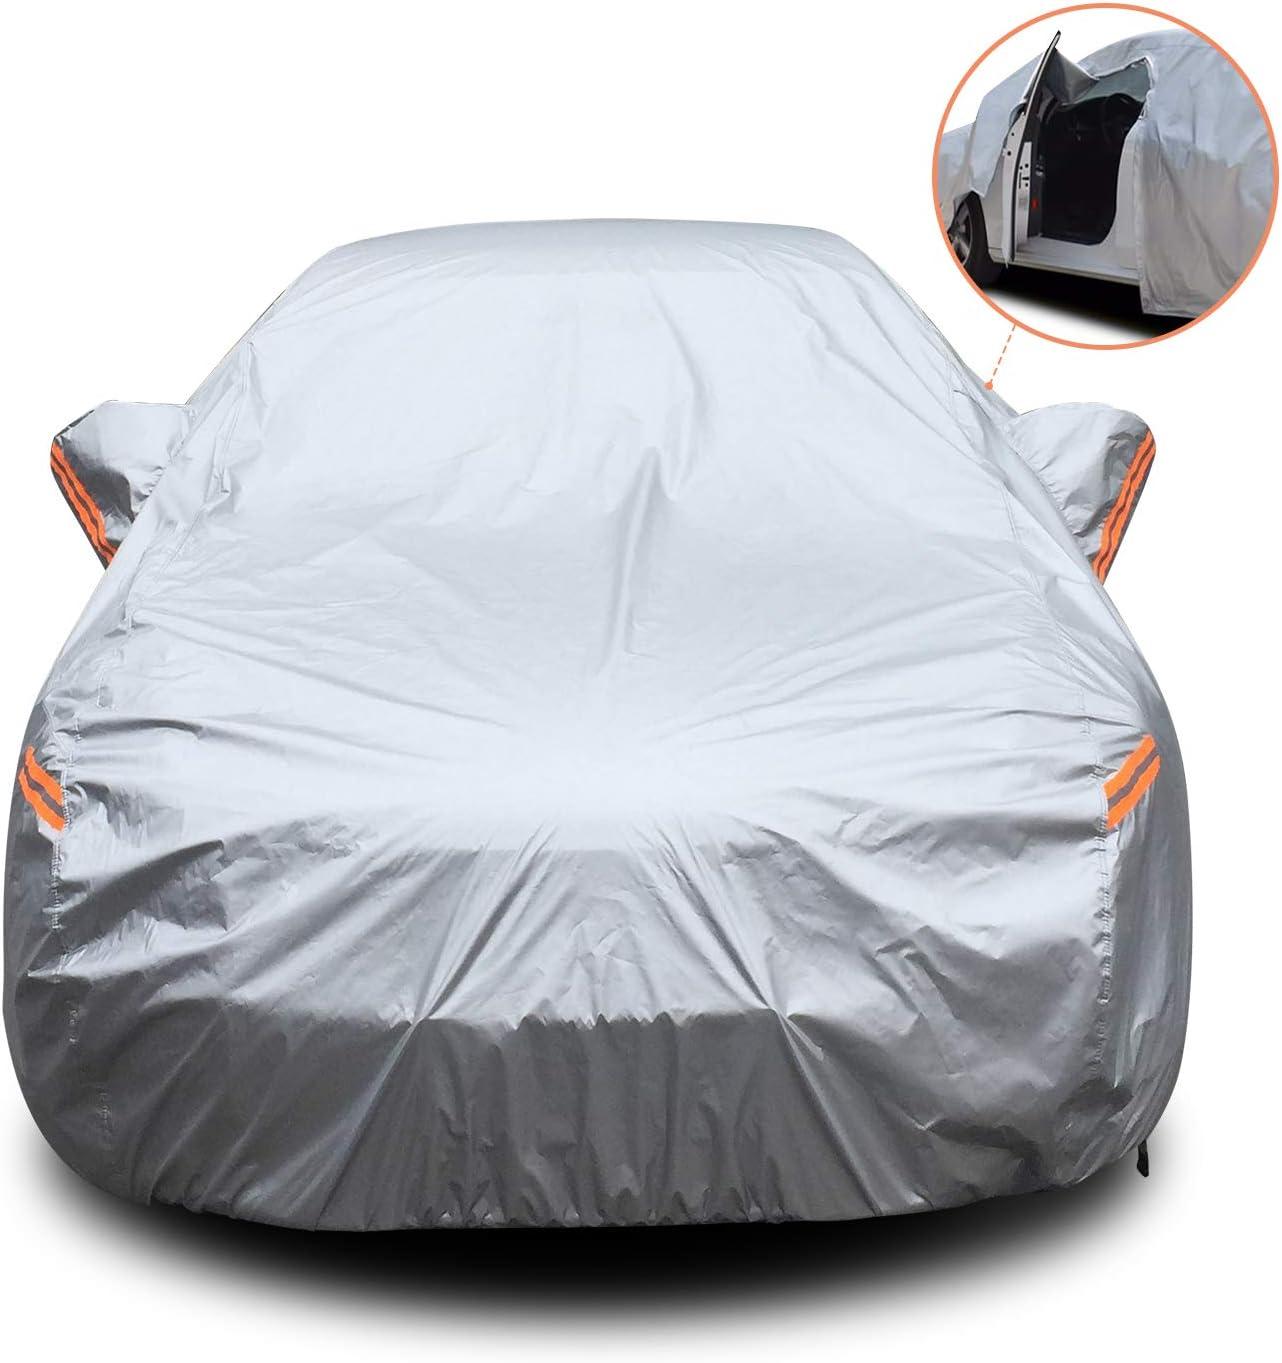 YIBEICO Funda para Coche Exterior Impermeable, Cubierta de Protección Automóvil con Raya Zip/Fluorescente (510X190X150cm)